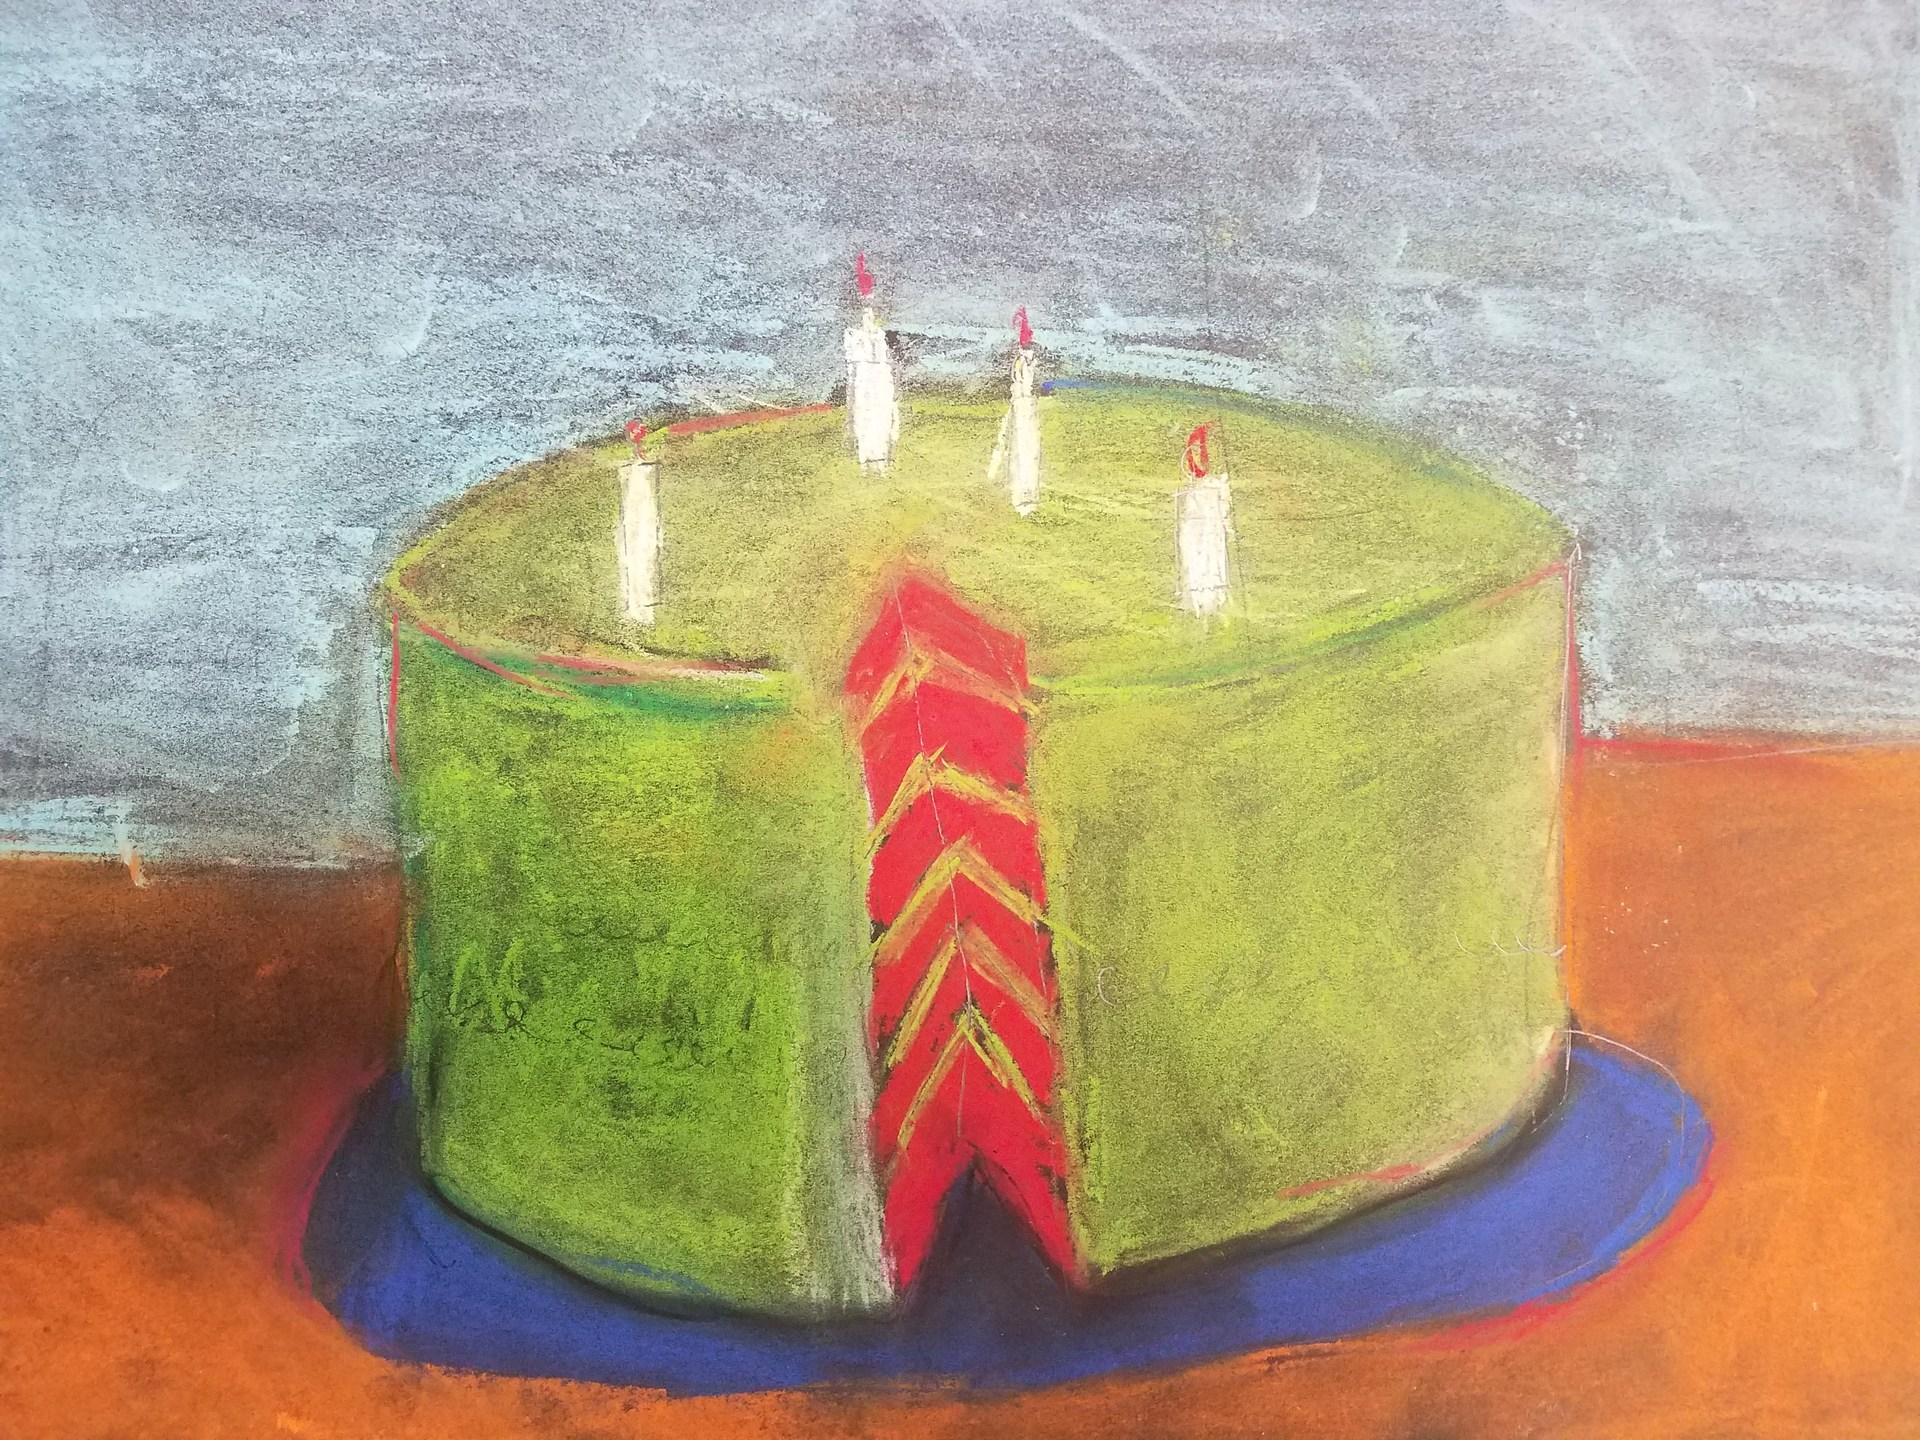 Wayne Thiebaud inspired pastel drawing by Steven Davis